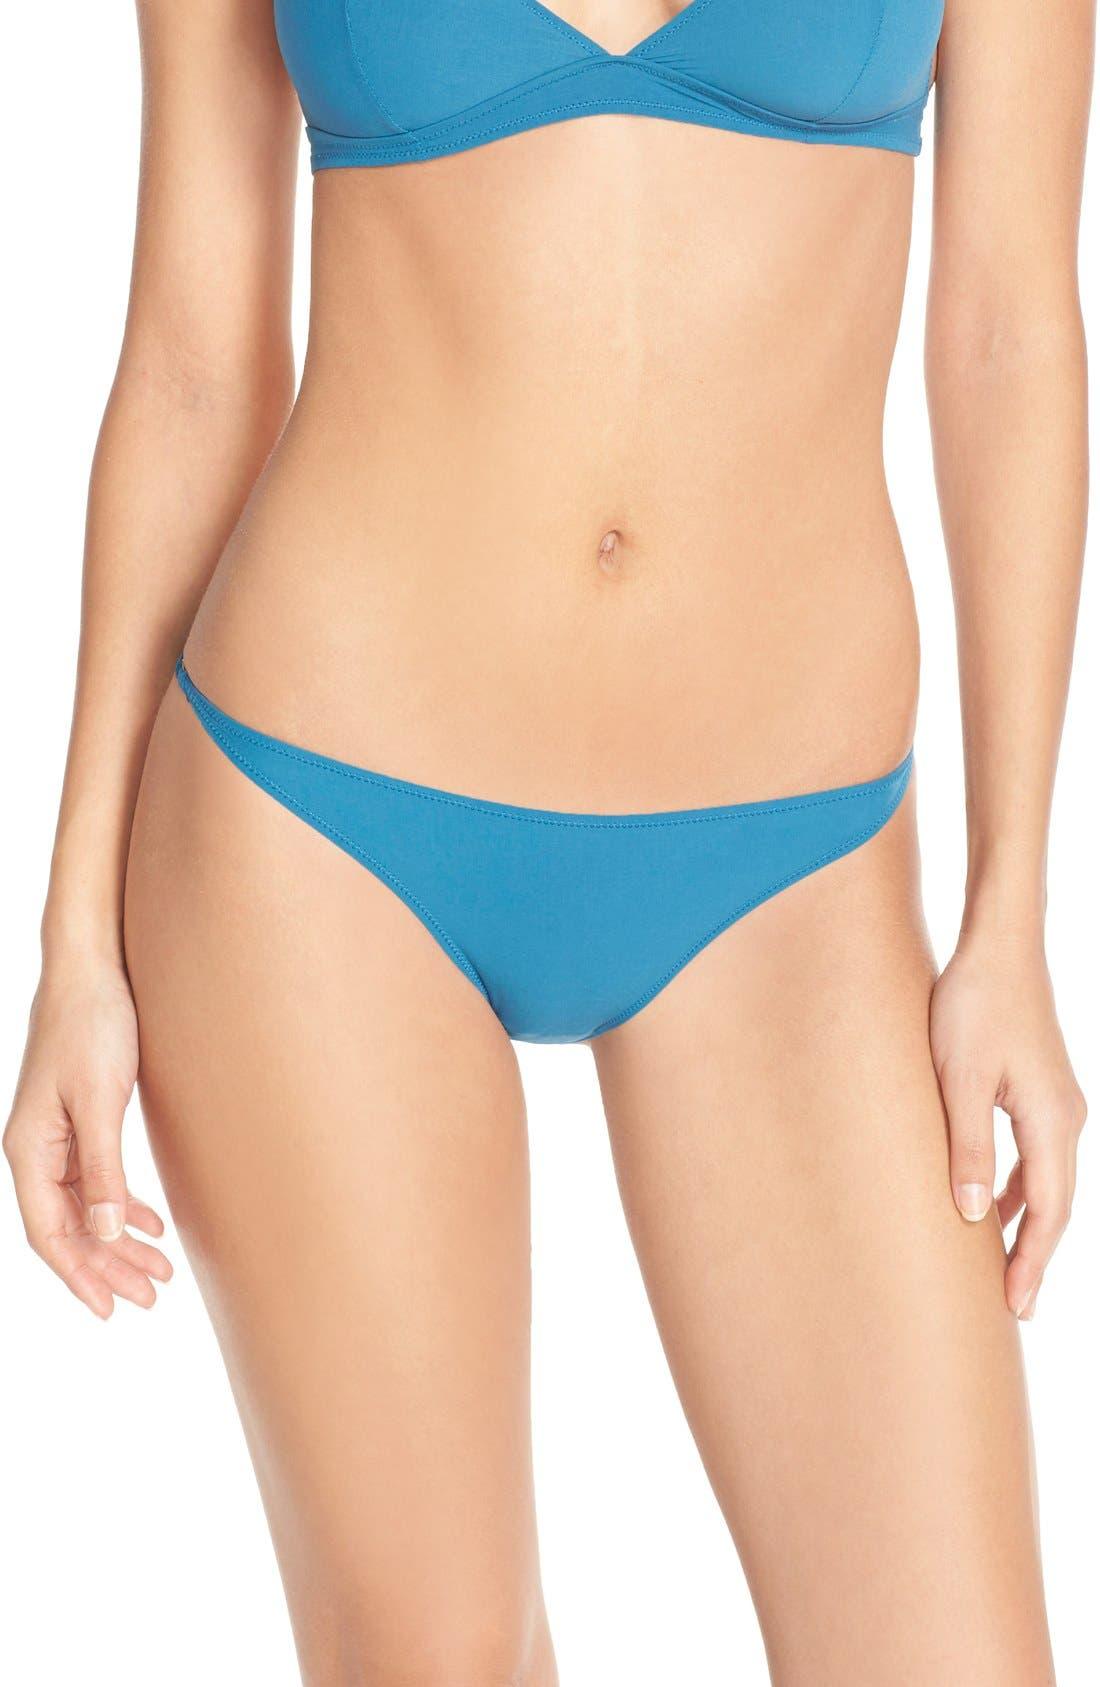 Addiction Nouvelle Lingerie 'Skin' Bikini